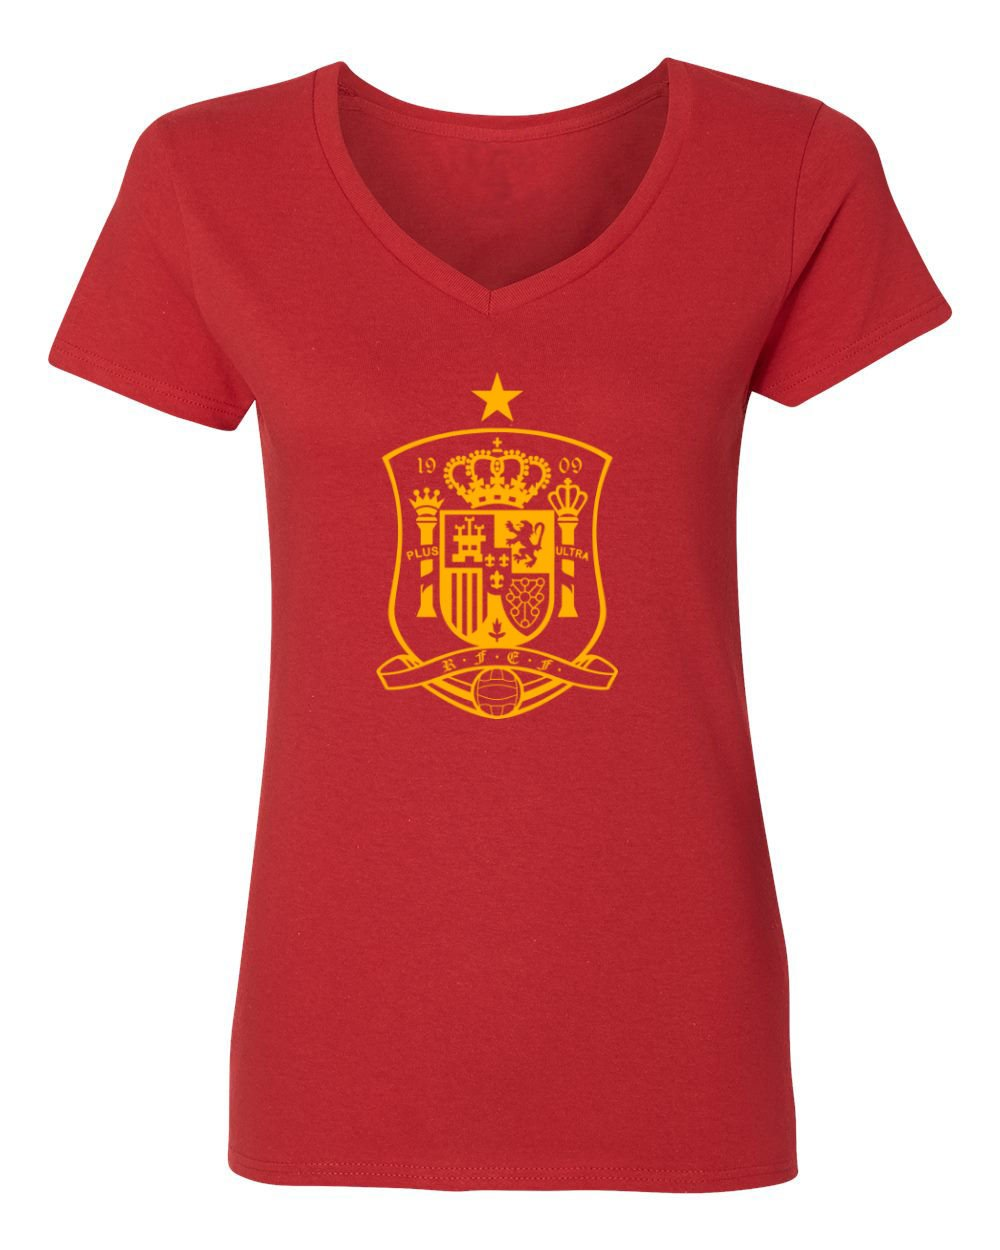 8bf886c5f Amazon.com  Tcamp Spain 2018 National Soccer  22 ISCO World Championship  Women s V-Neck Tshirt  Sports   Outdoors